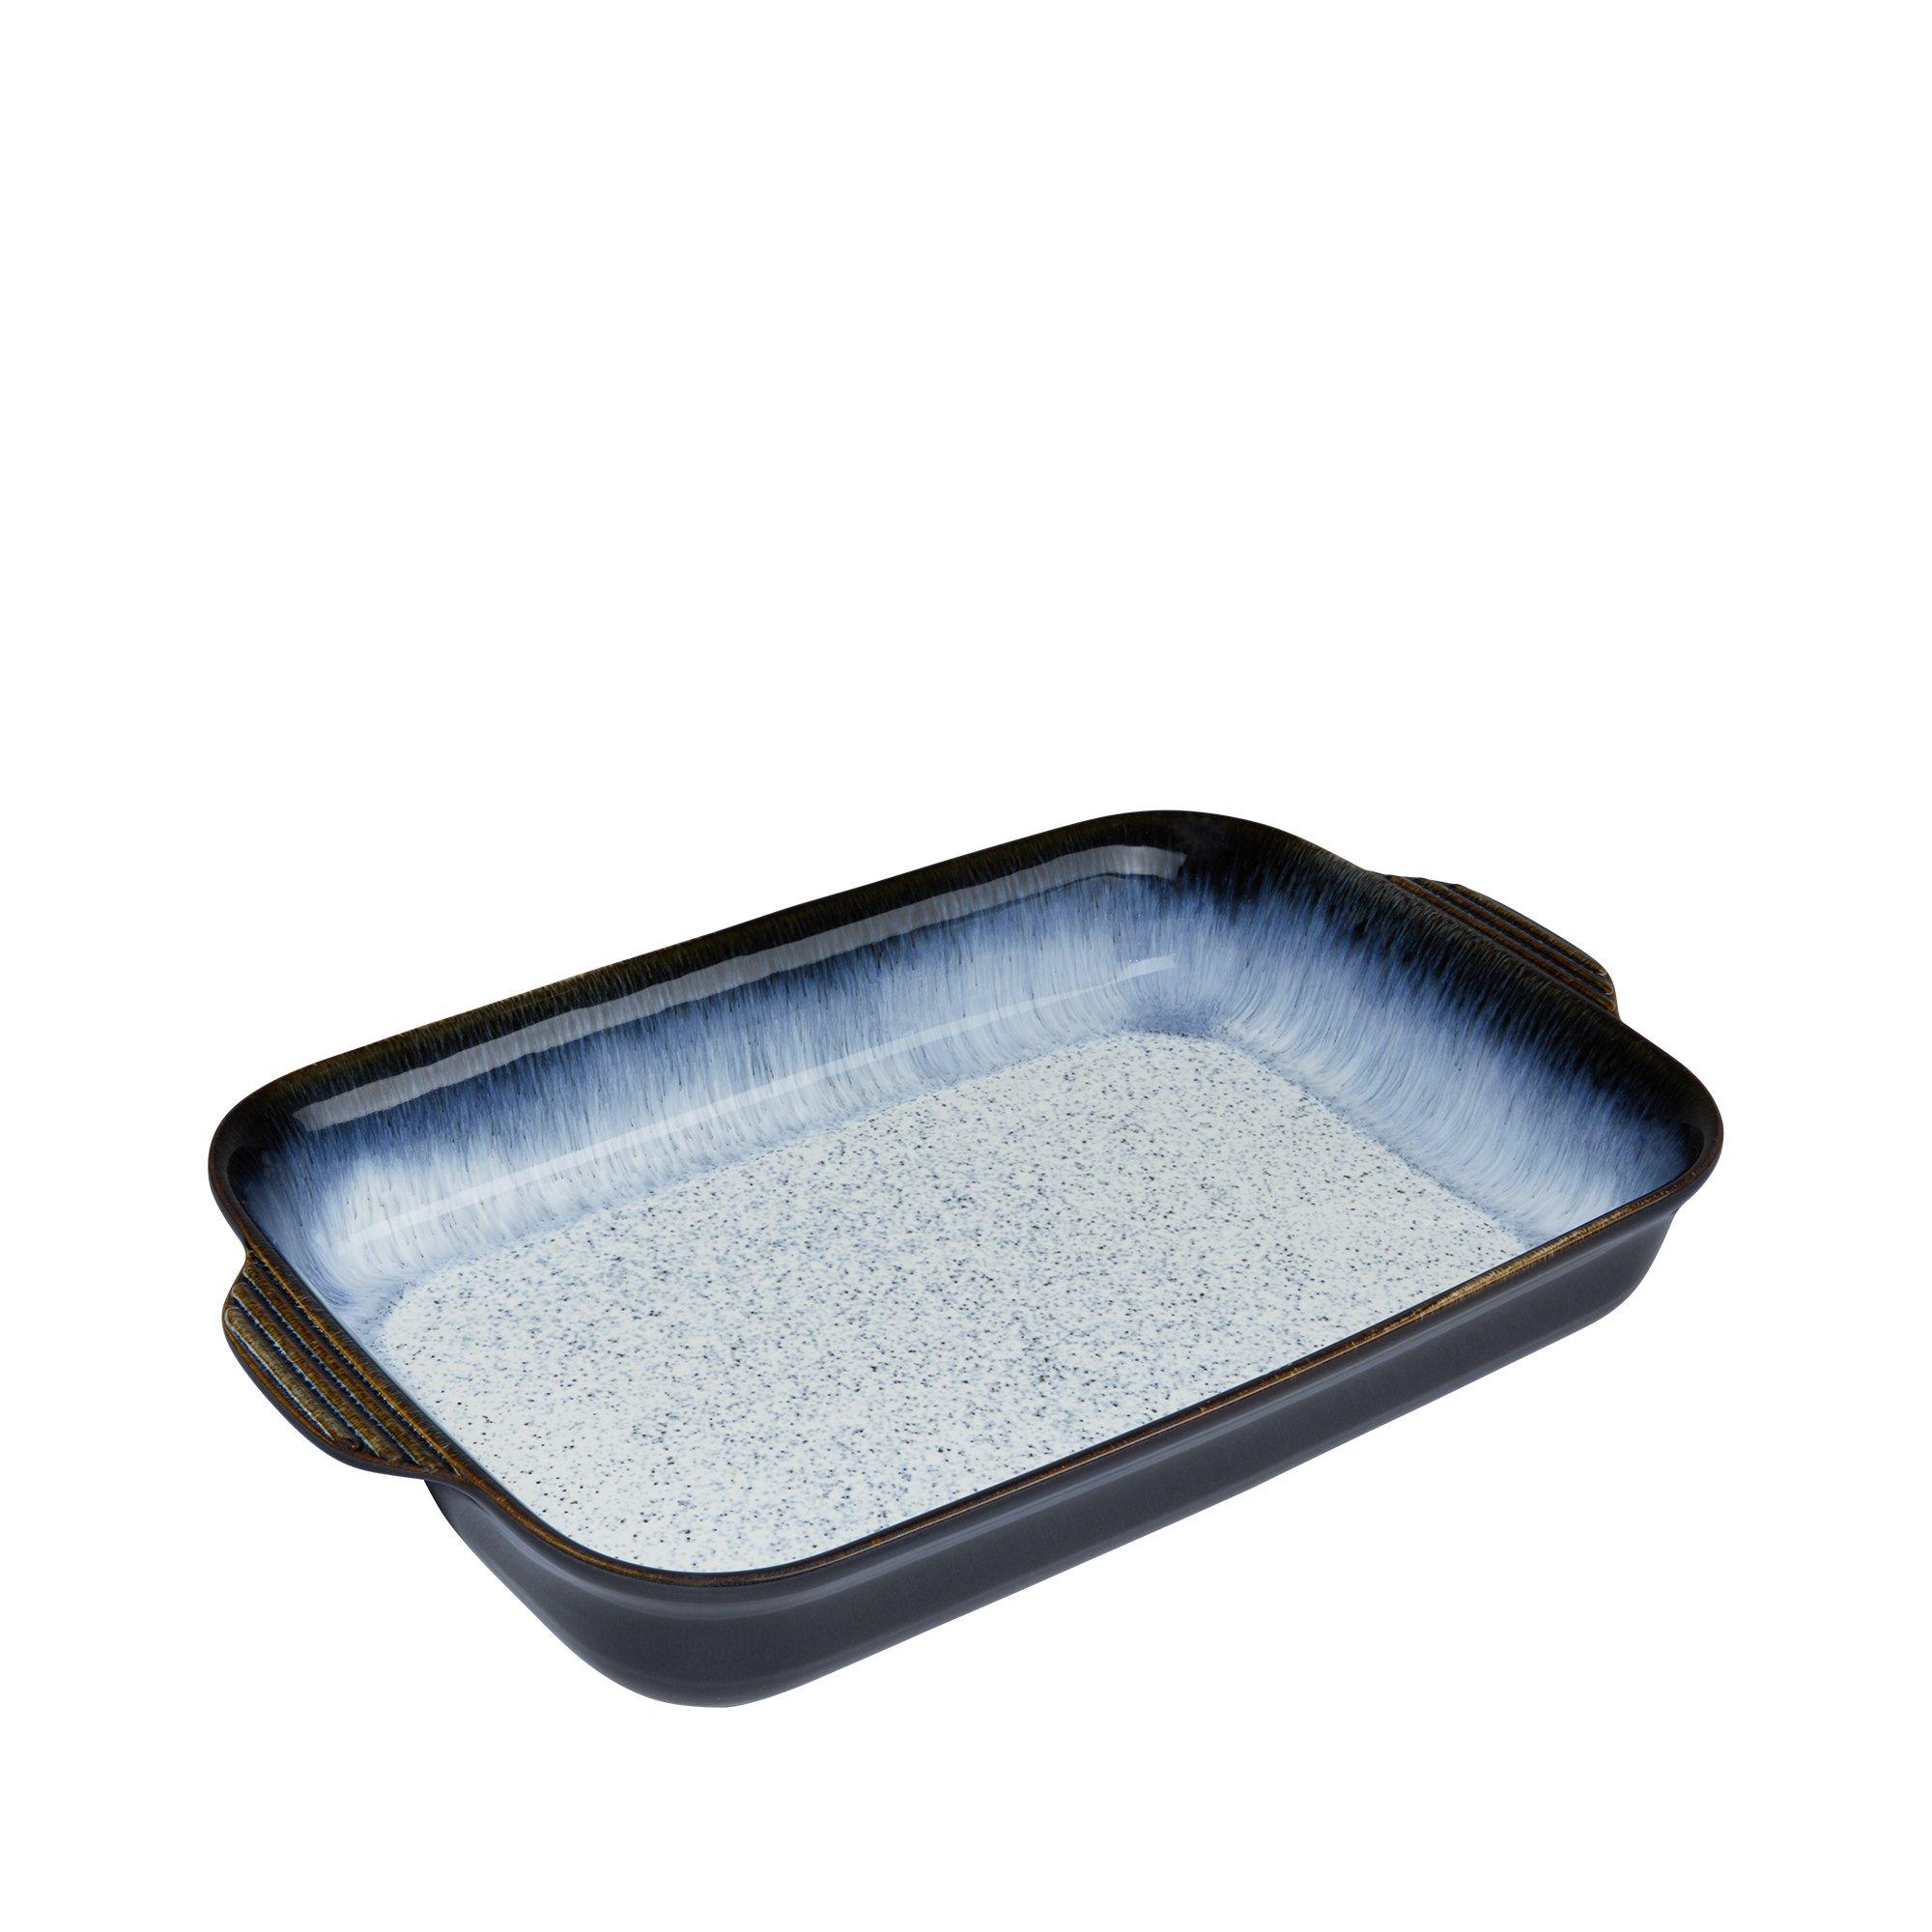 Denby USA Halo Alt Large Rectangular Oven Dish, Blue